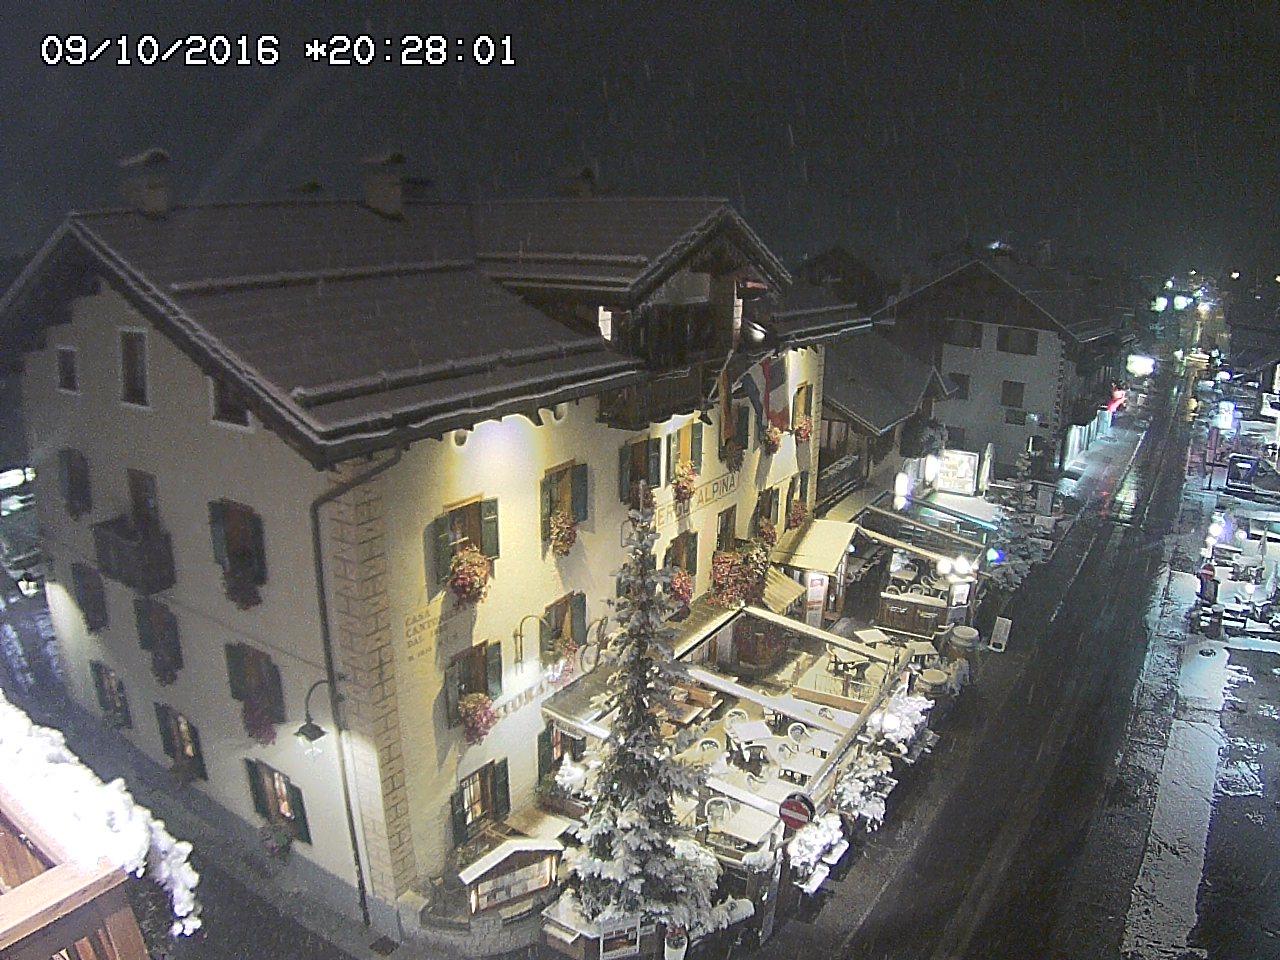 Nevicata a Livigno, 9 ottobre 2016